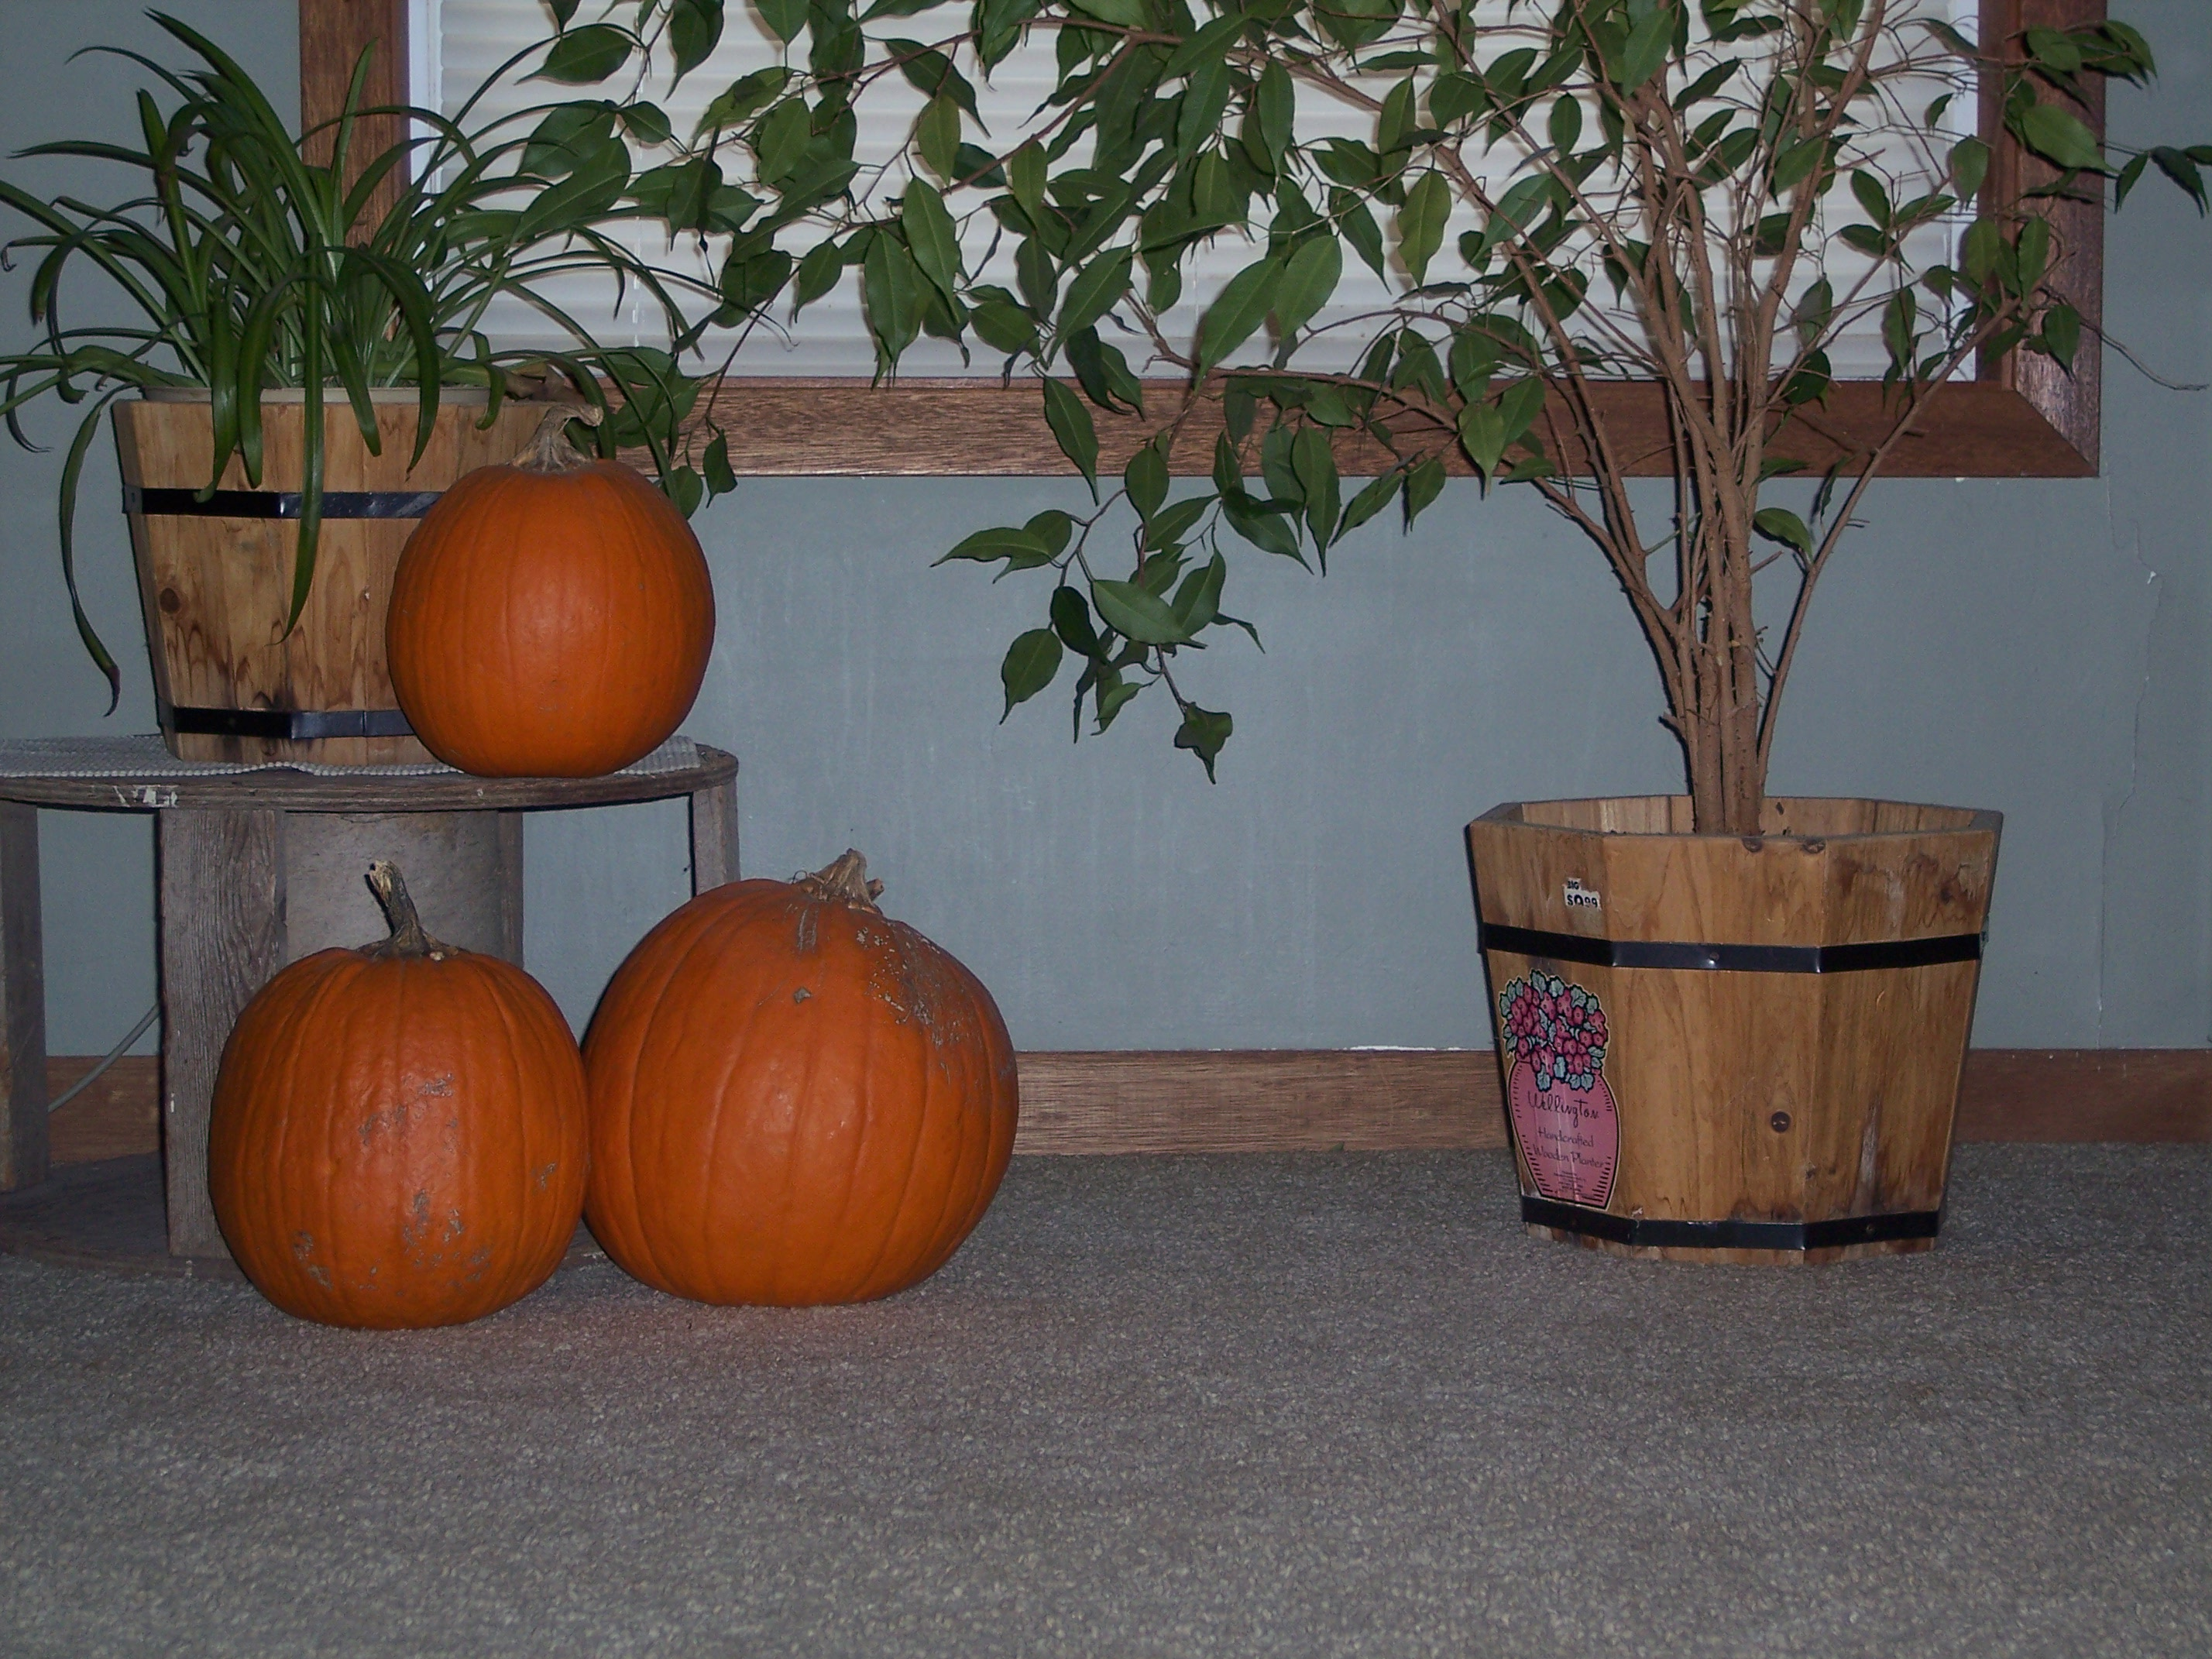 Pumpkins in February